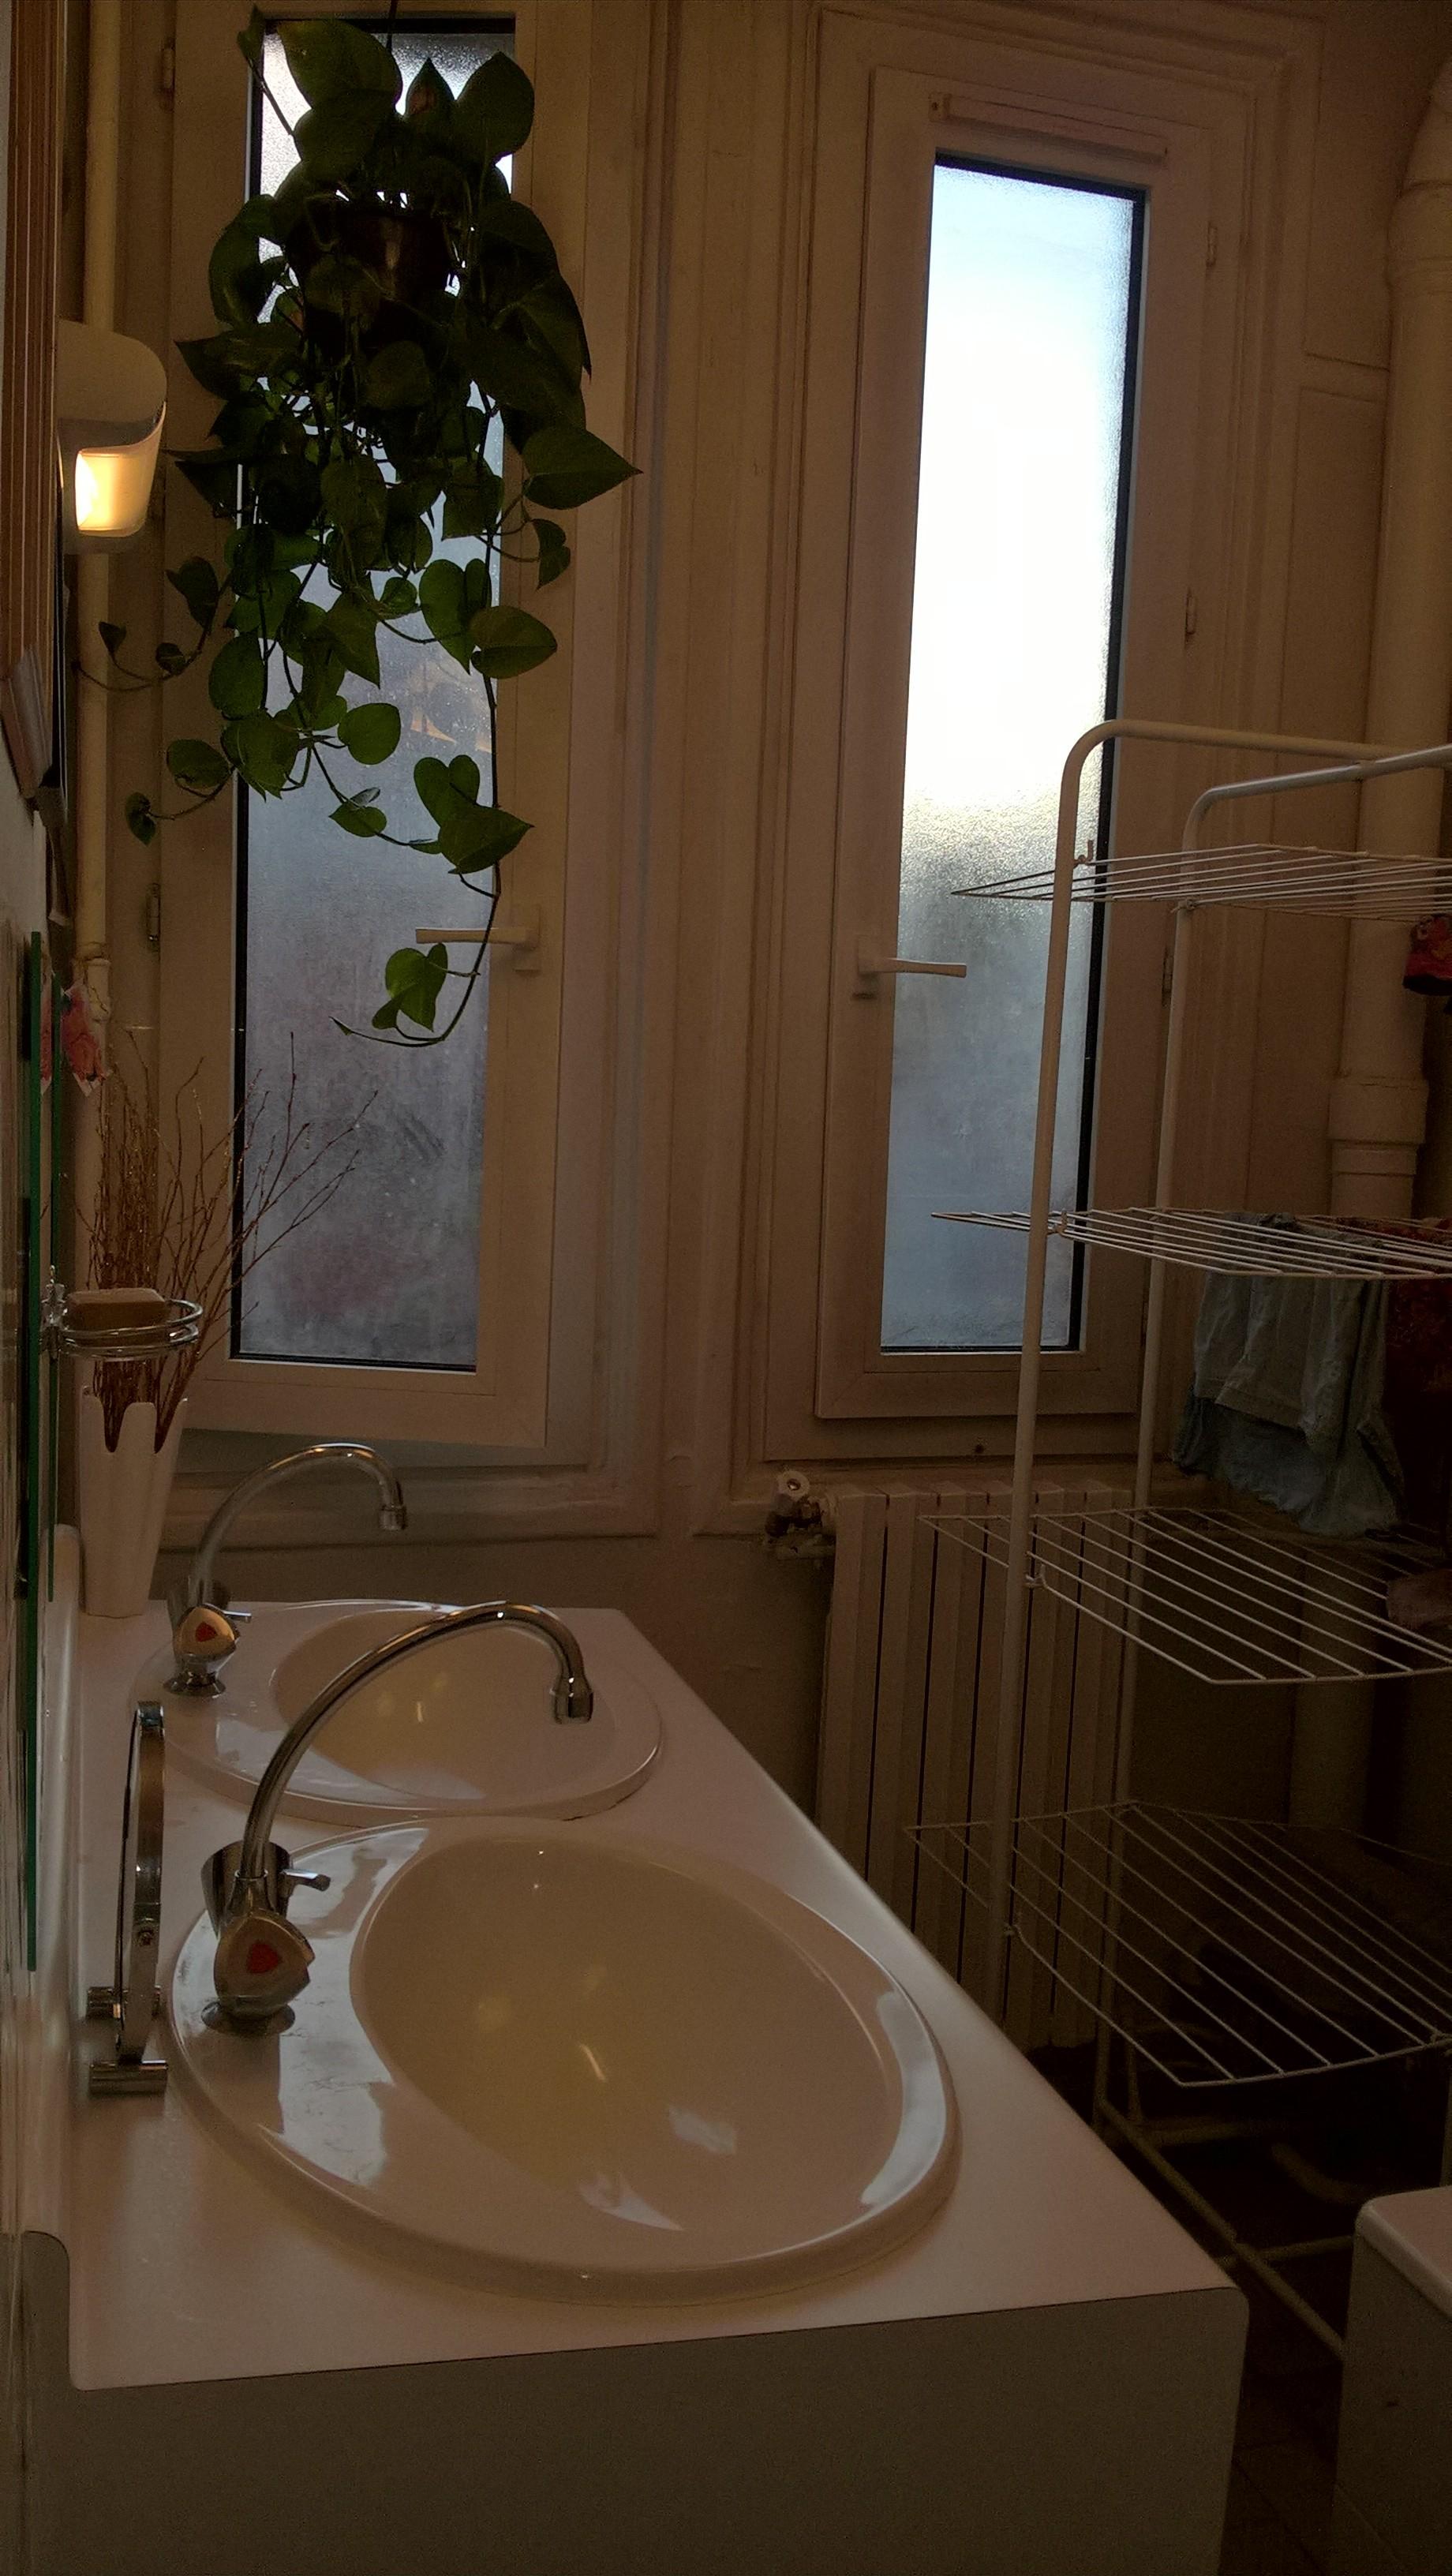 salle de bain erasmus photo paris